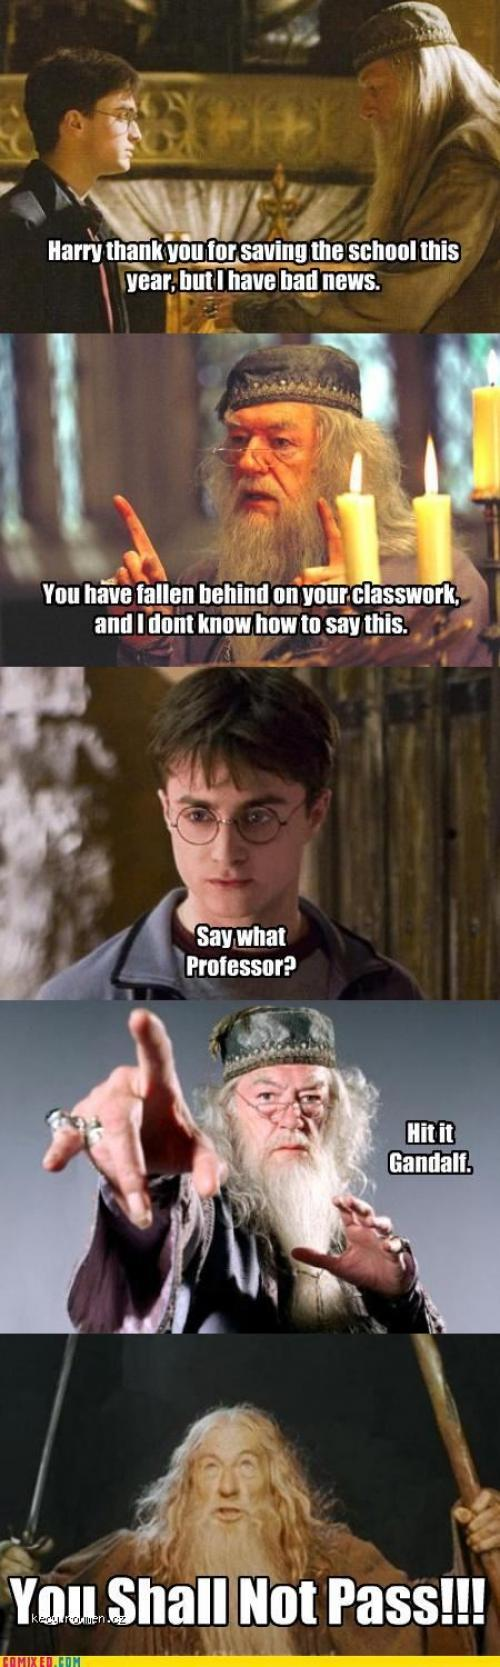 potter fails